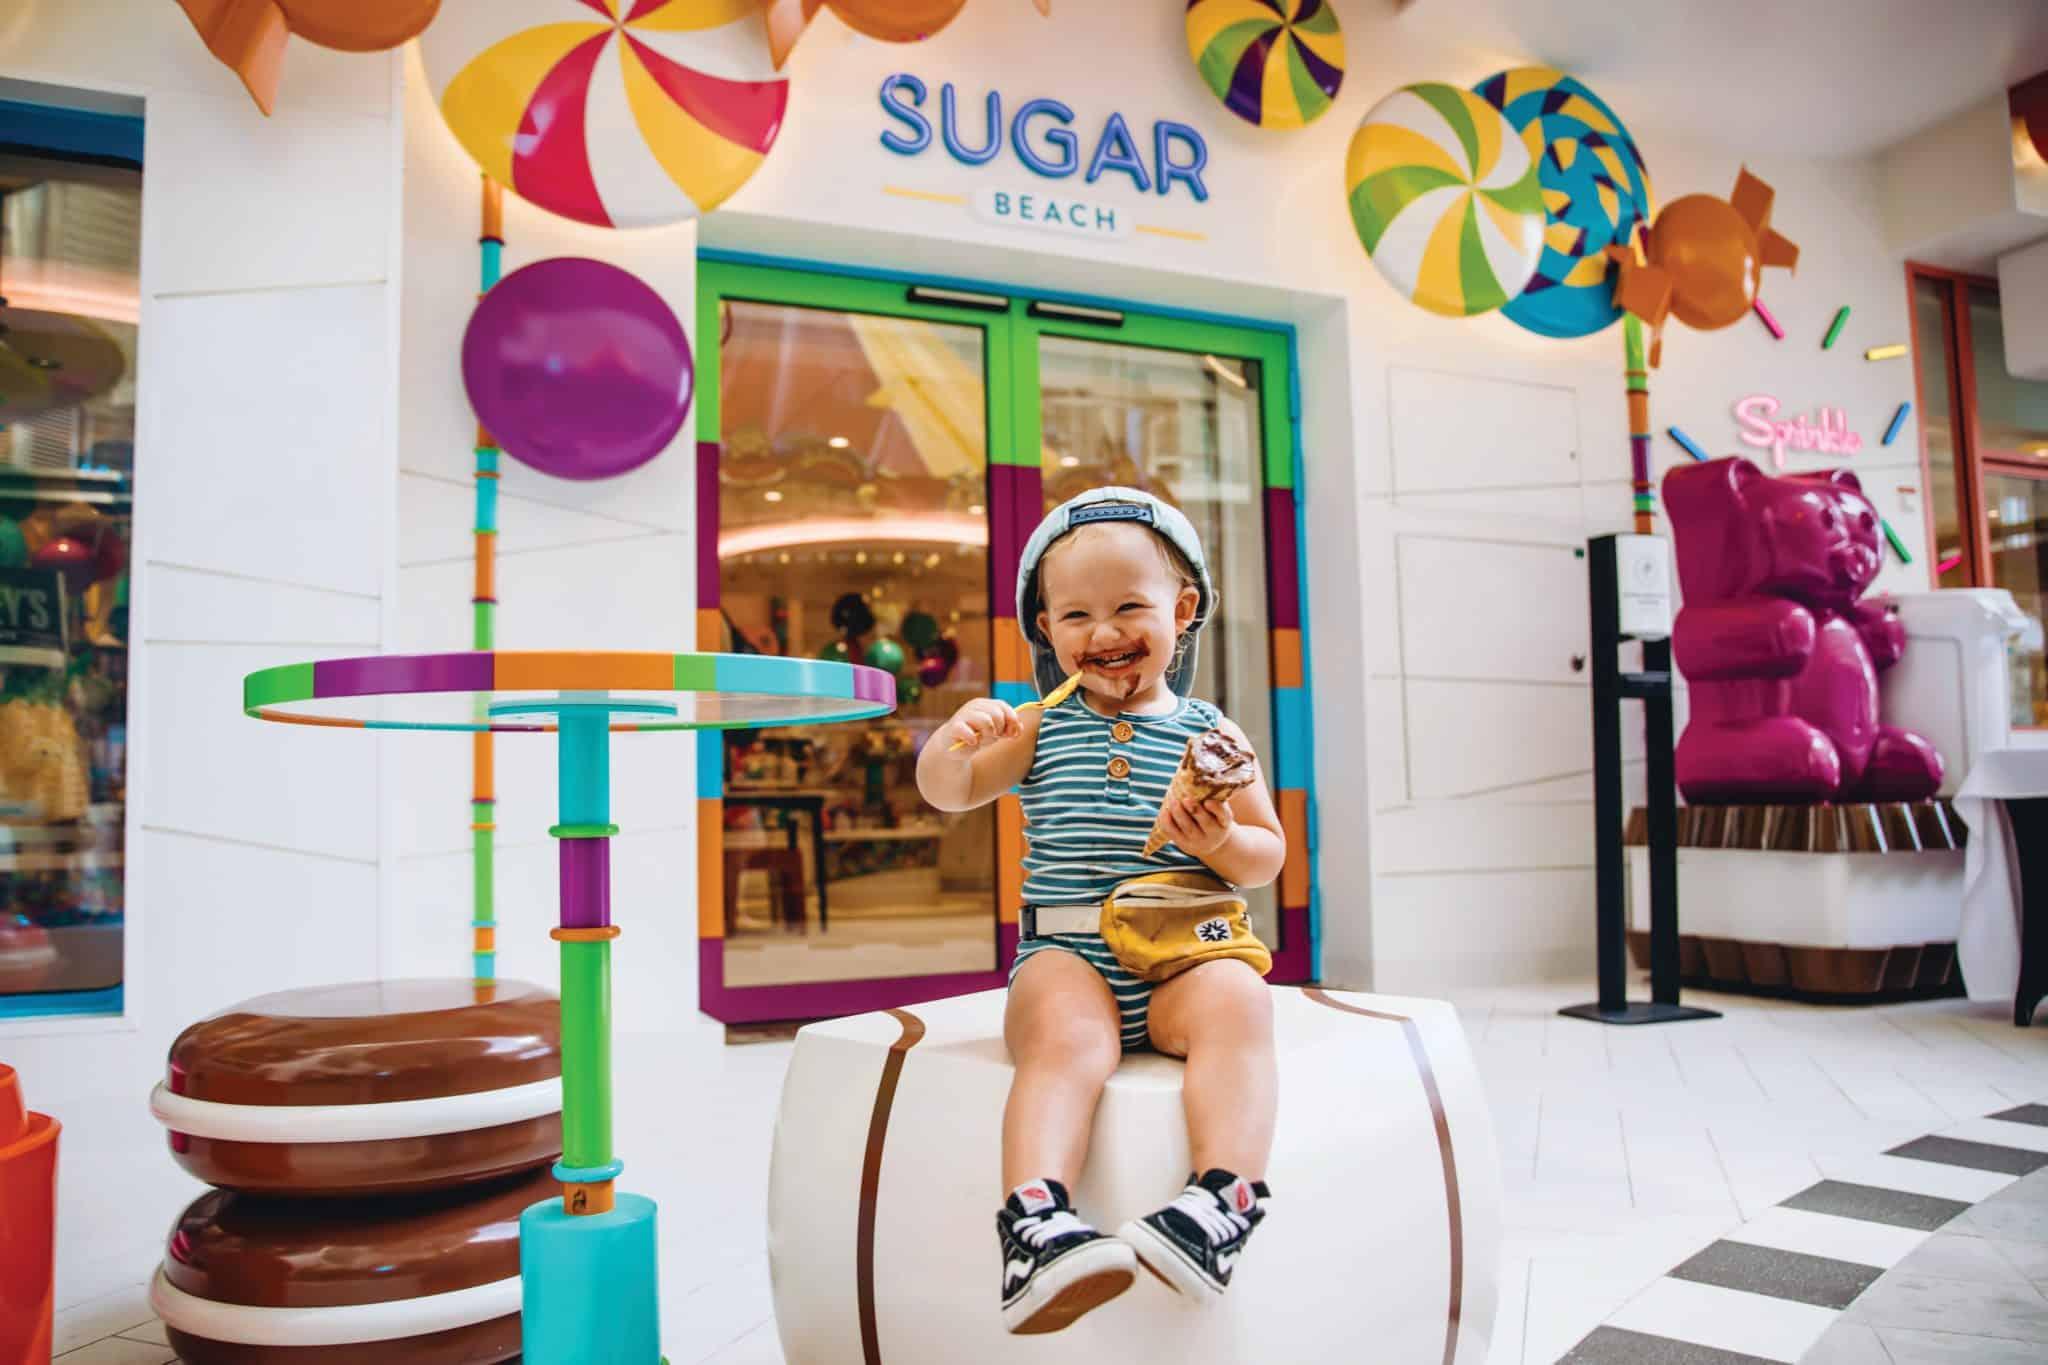 royal caribbean sugar beach kids baby toddler